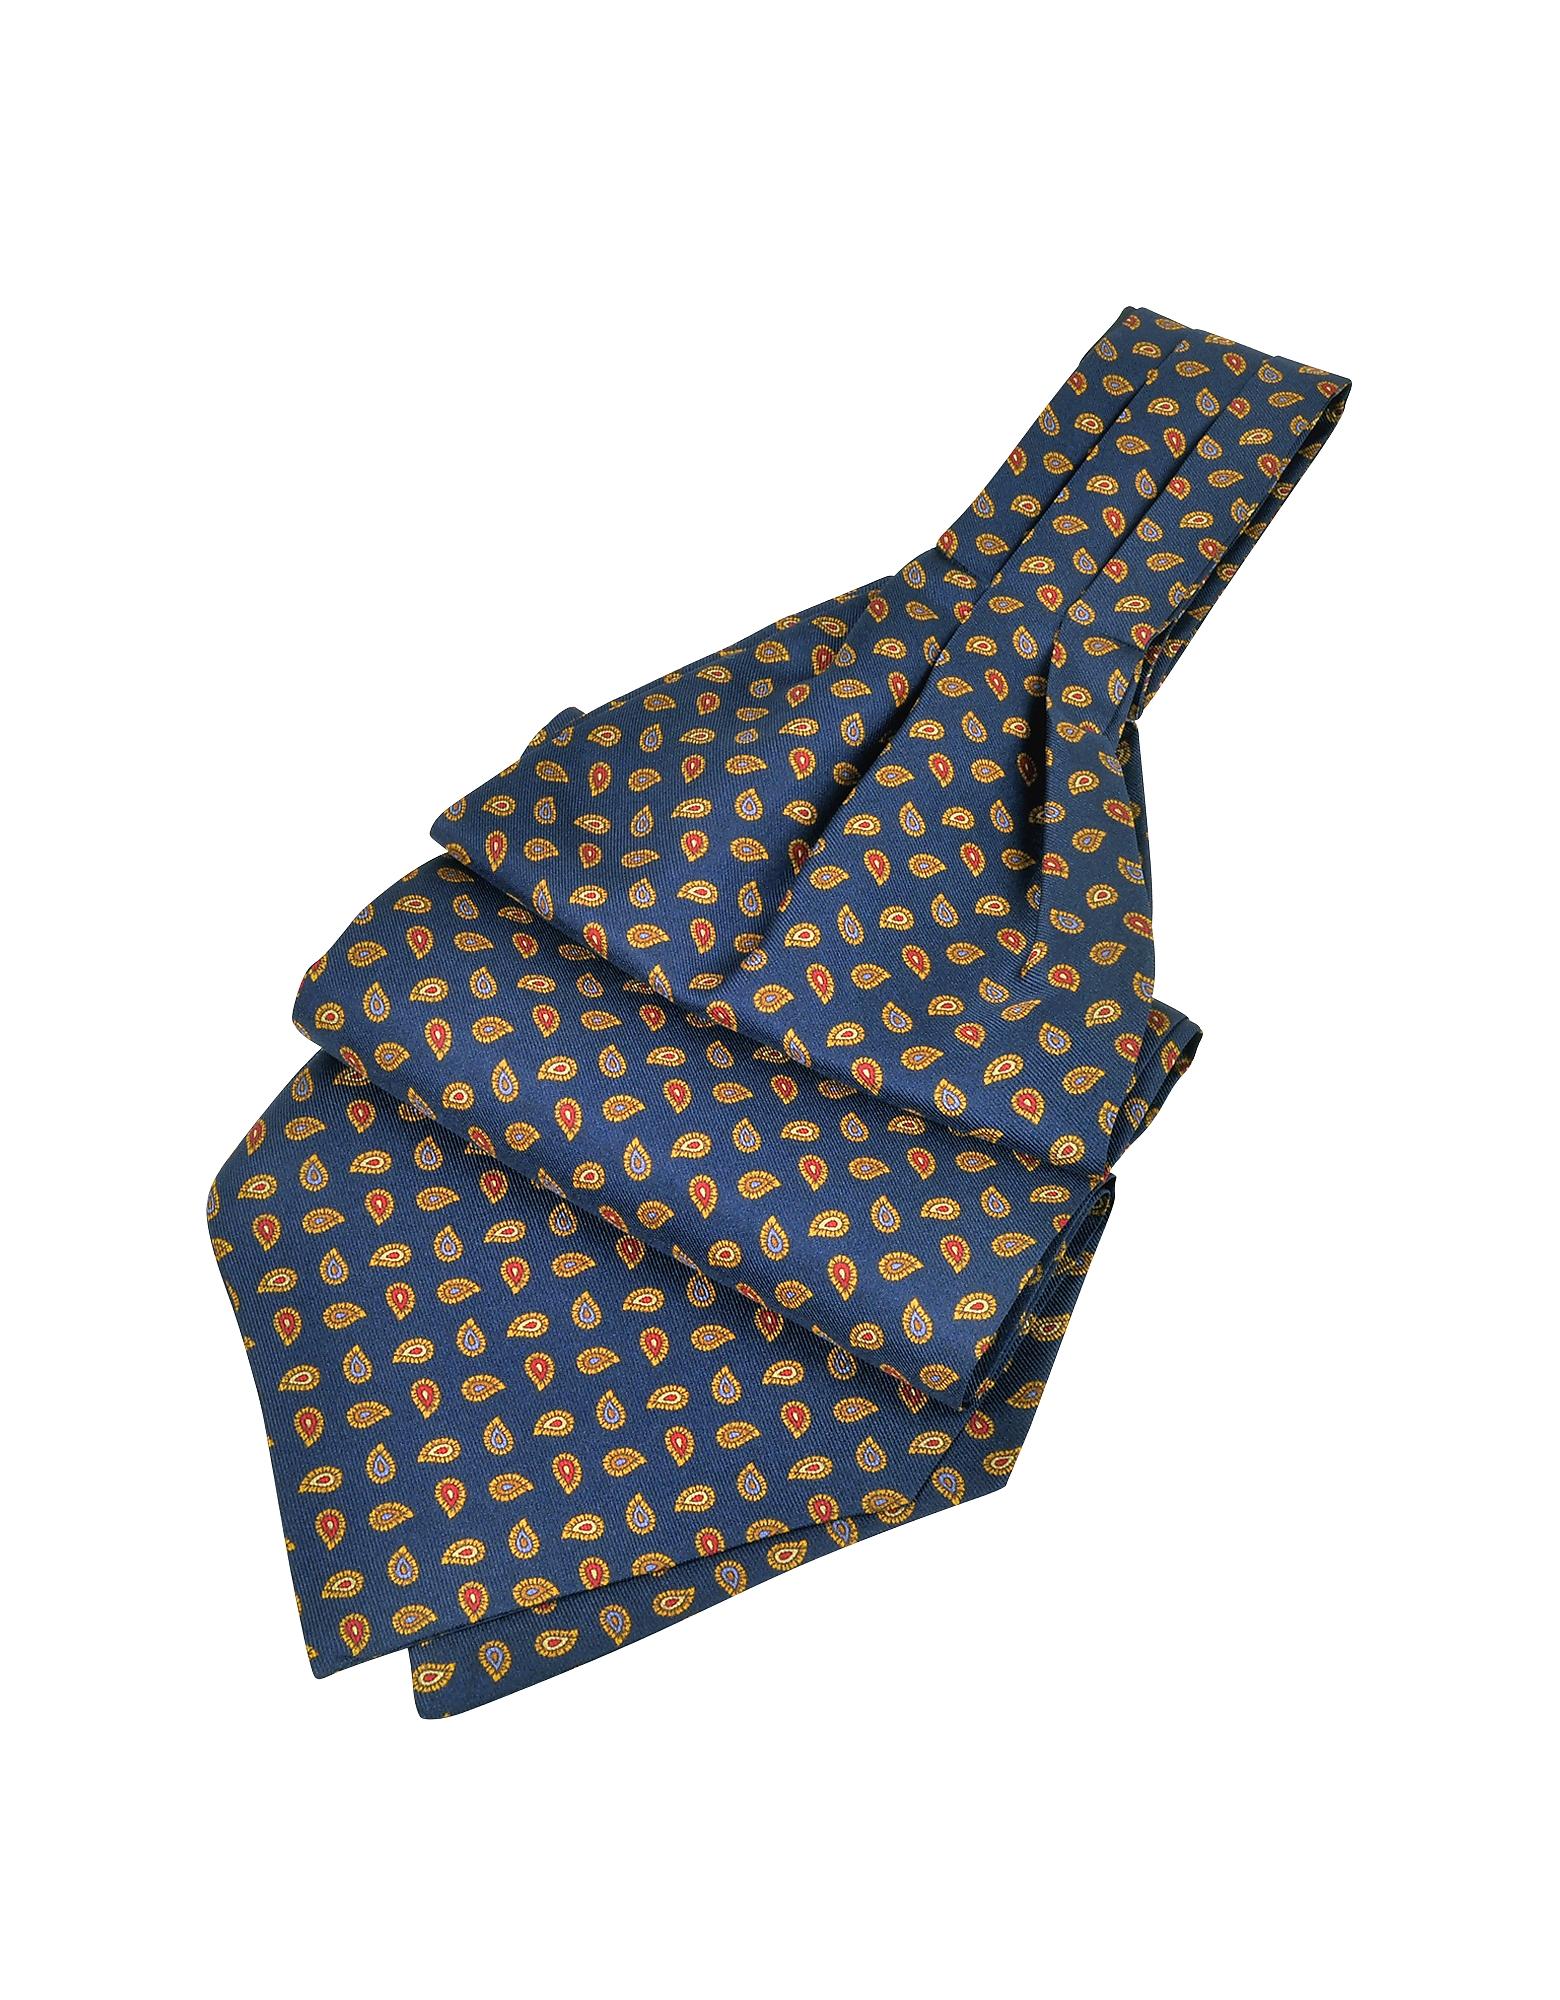 Image of Forzieri Designer Ascot ties, Mini Paisley Print Silk Ascot